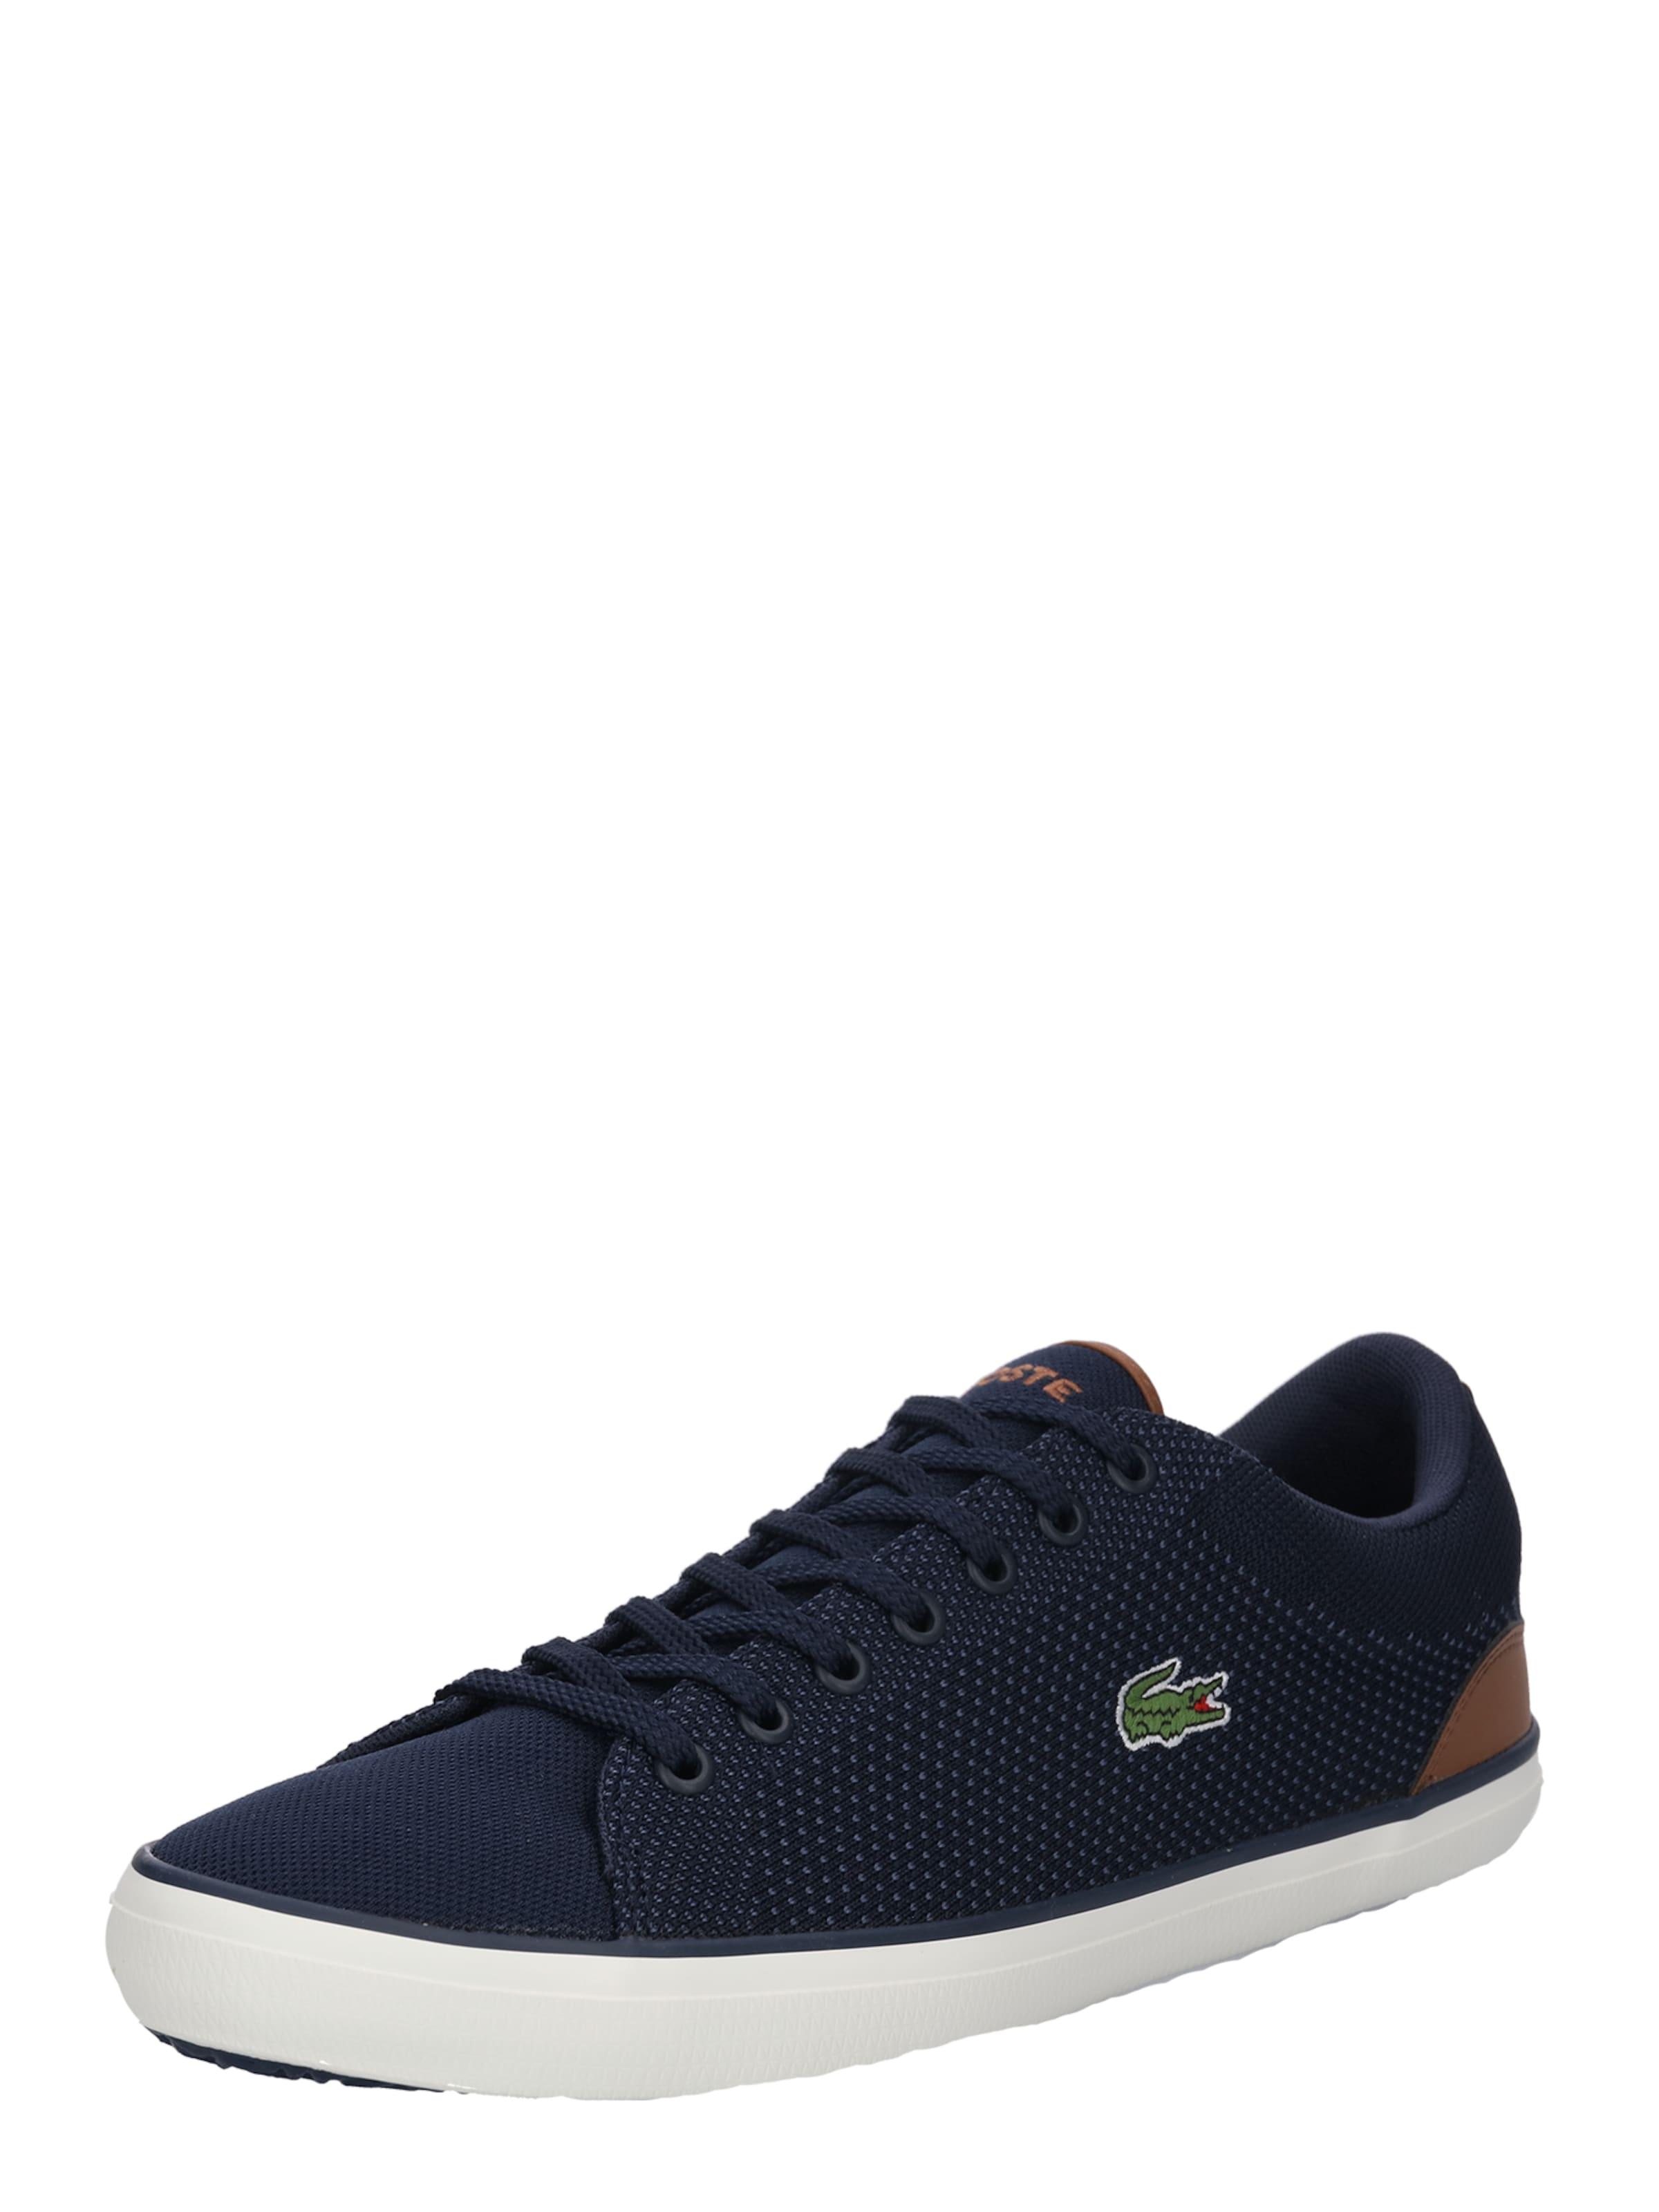 Haltbare Mode billige Schuhe LACOSTE | Sneaker Low 'LEROND' Schuhe Gut getragene Schuhe